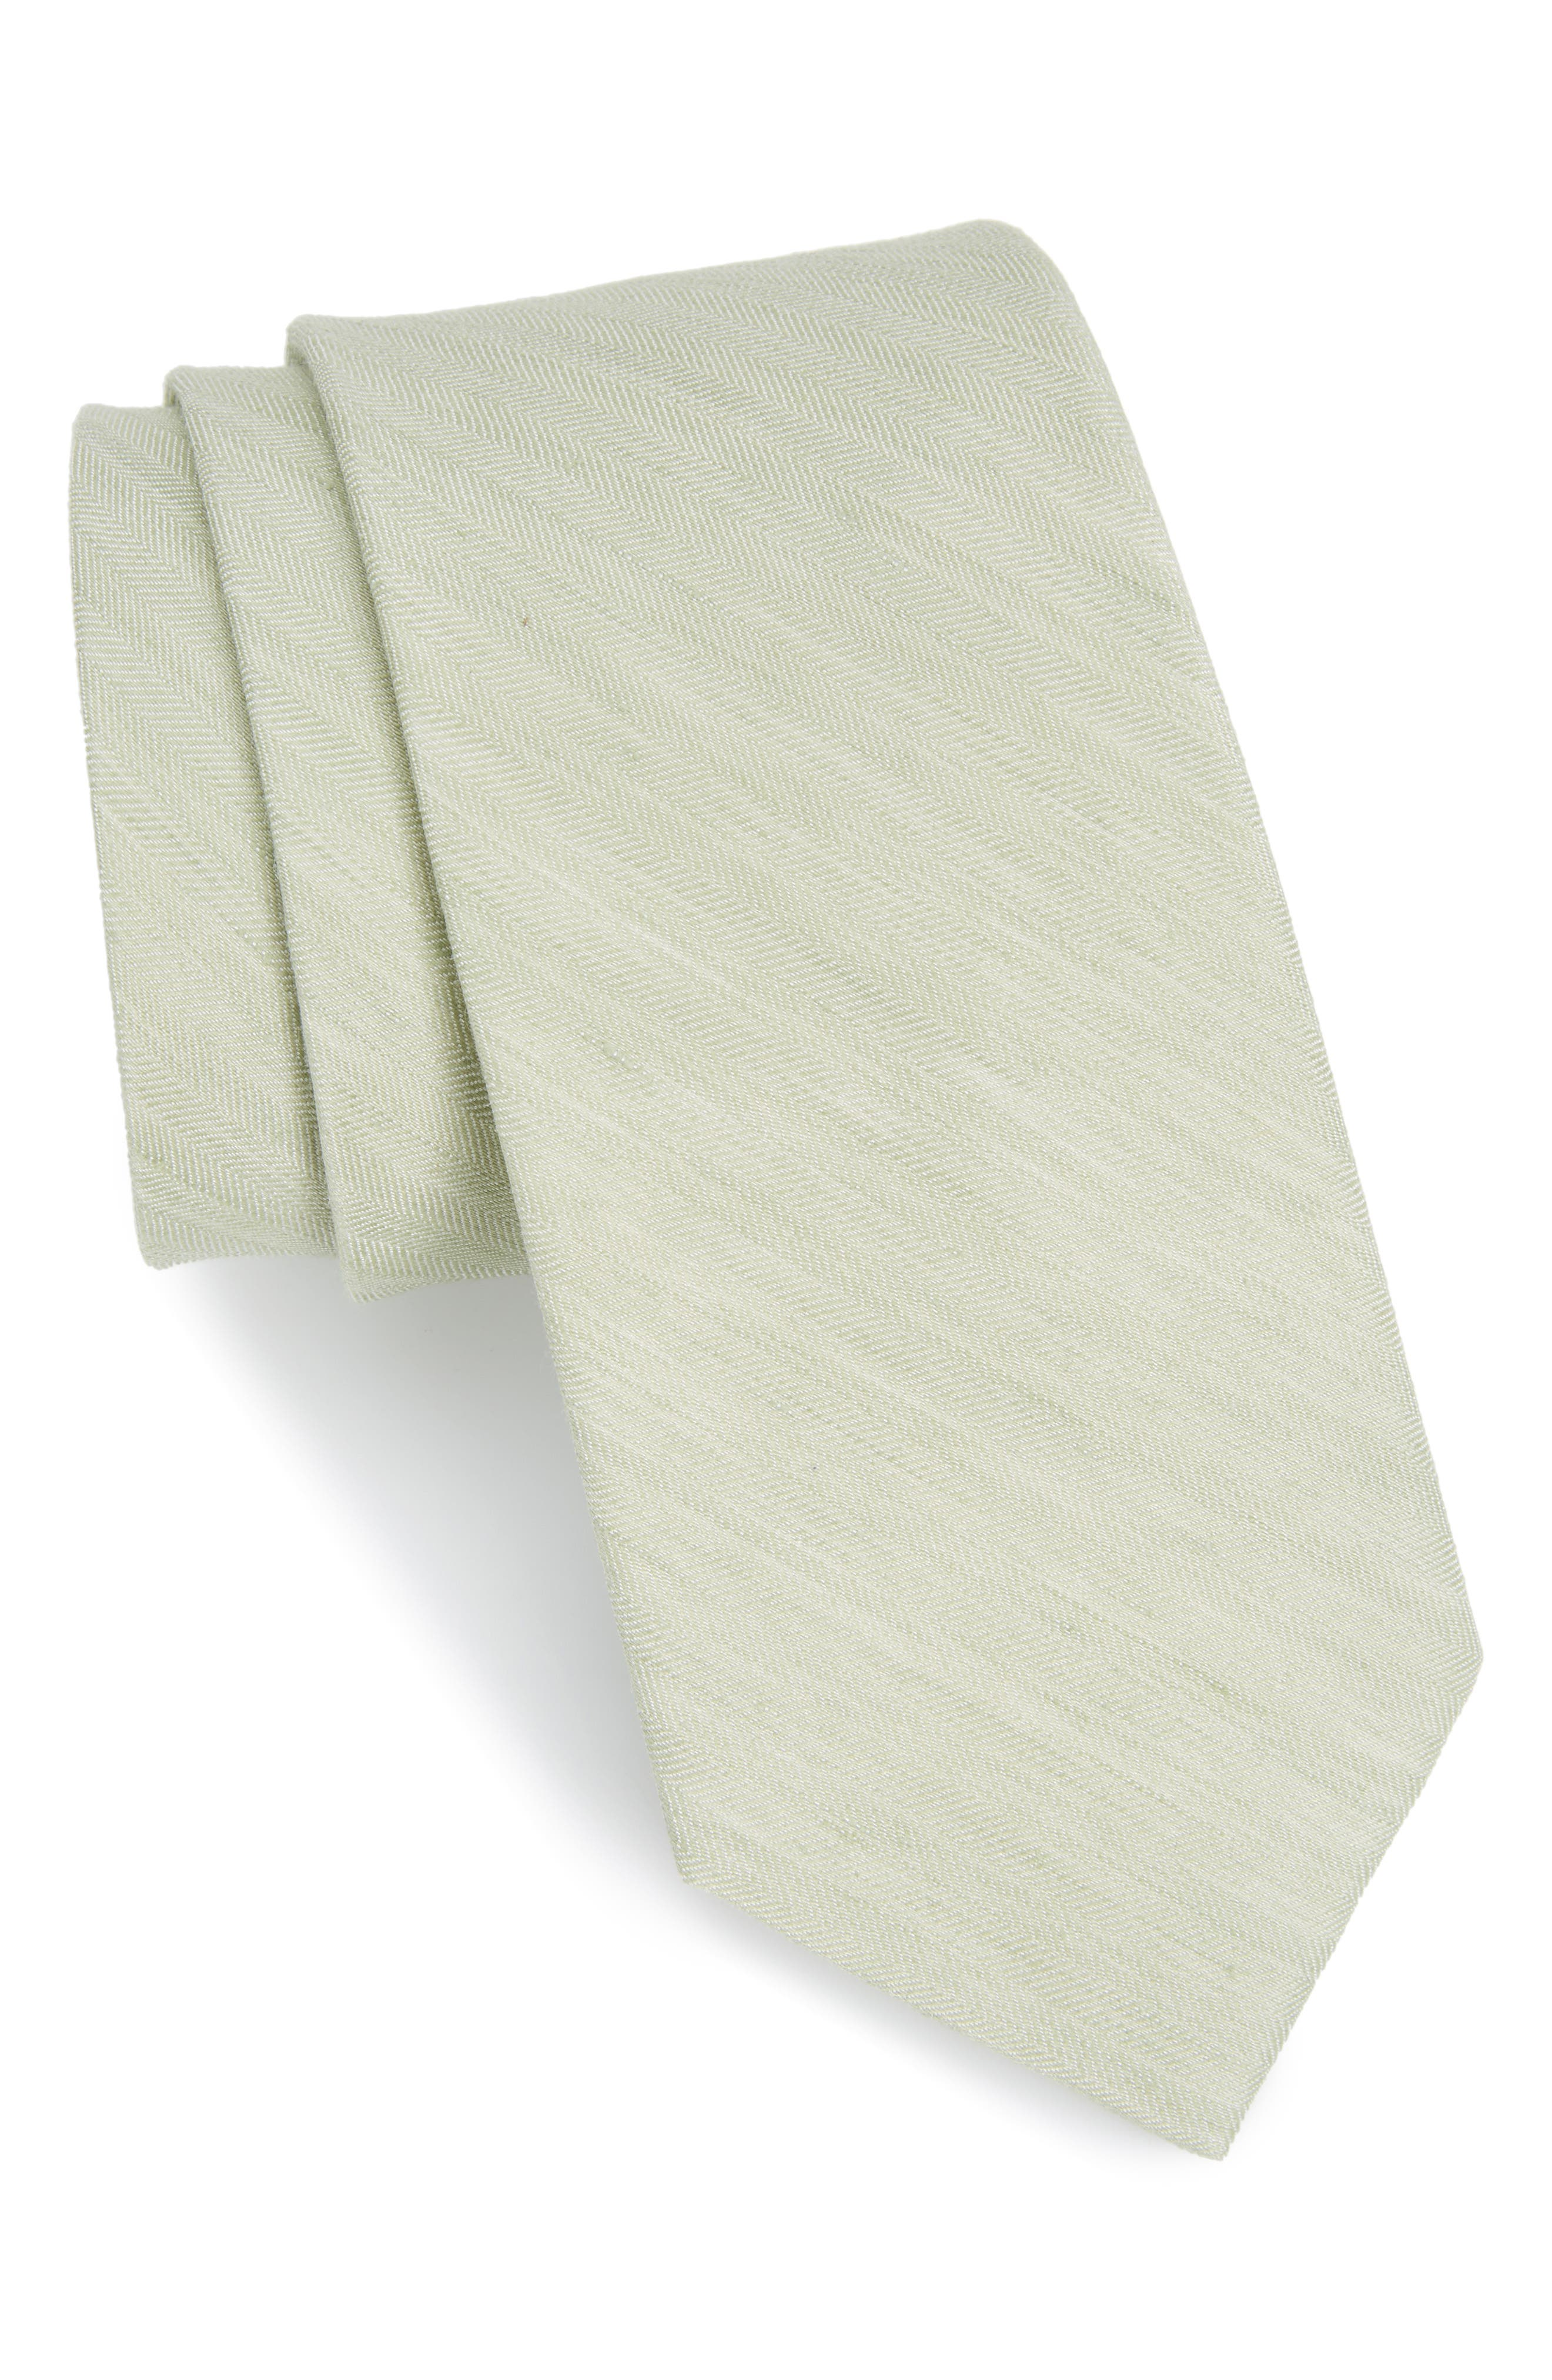 Main Image - The Tie Bar Solid Linen & Silk Tie